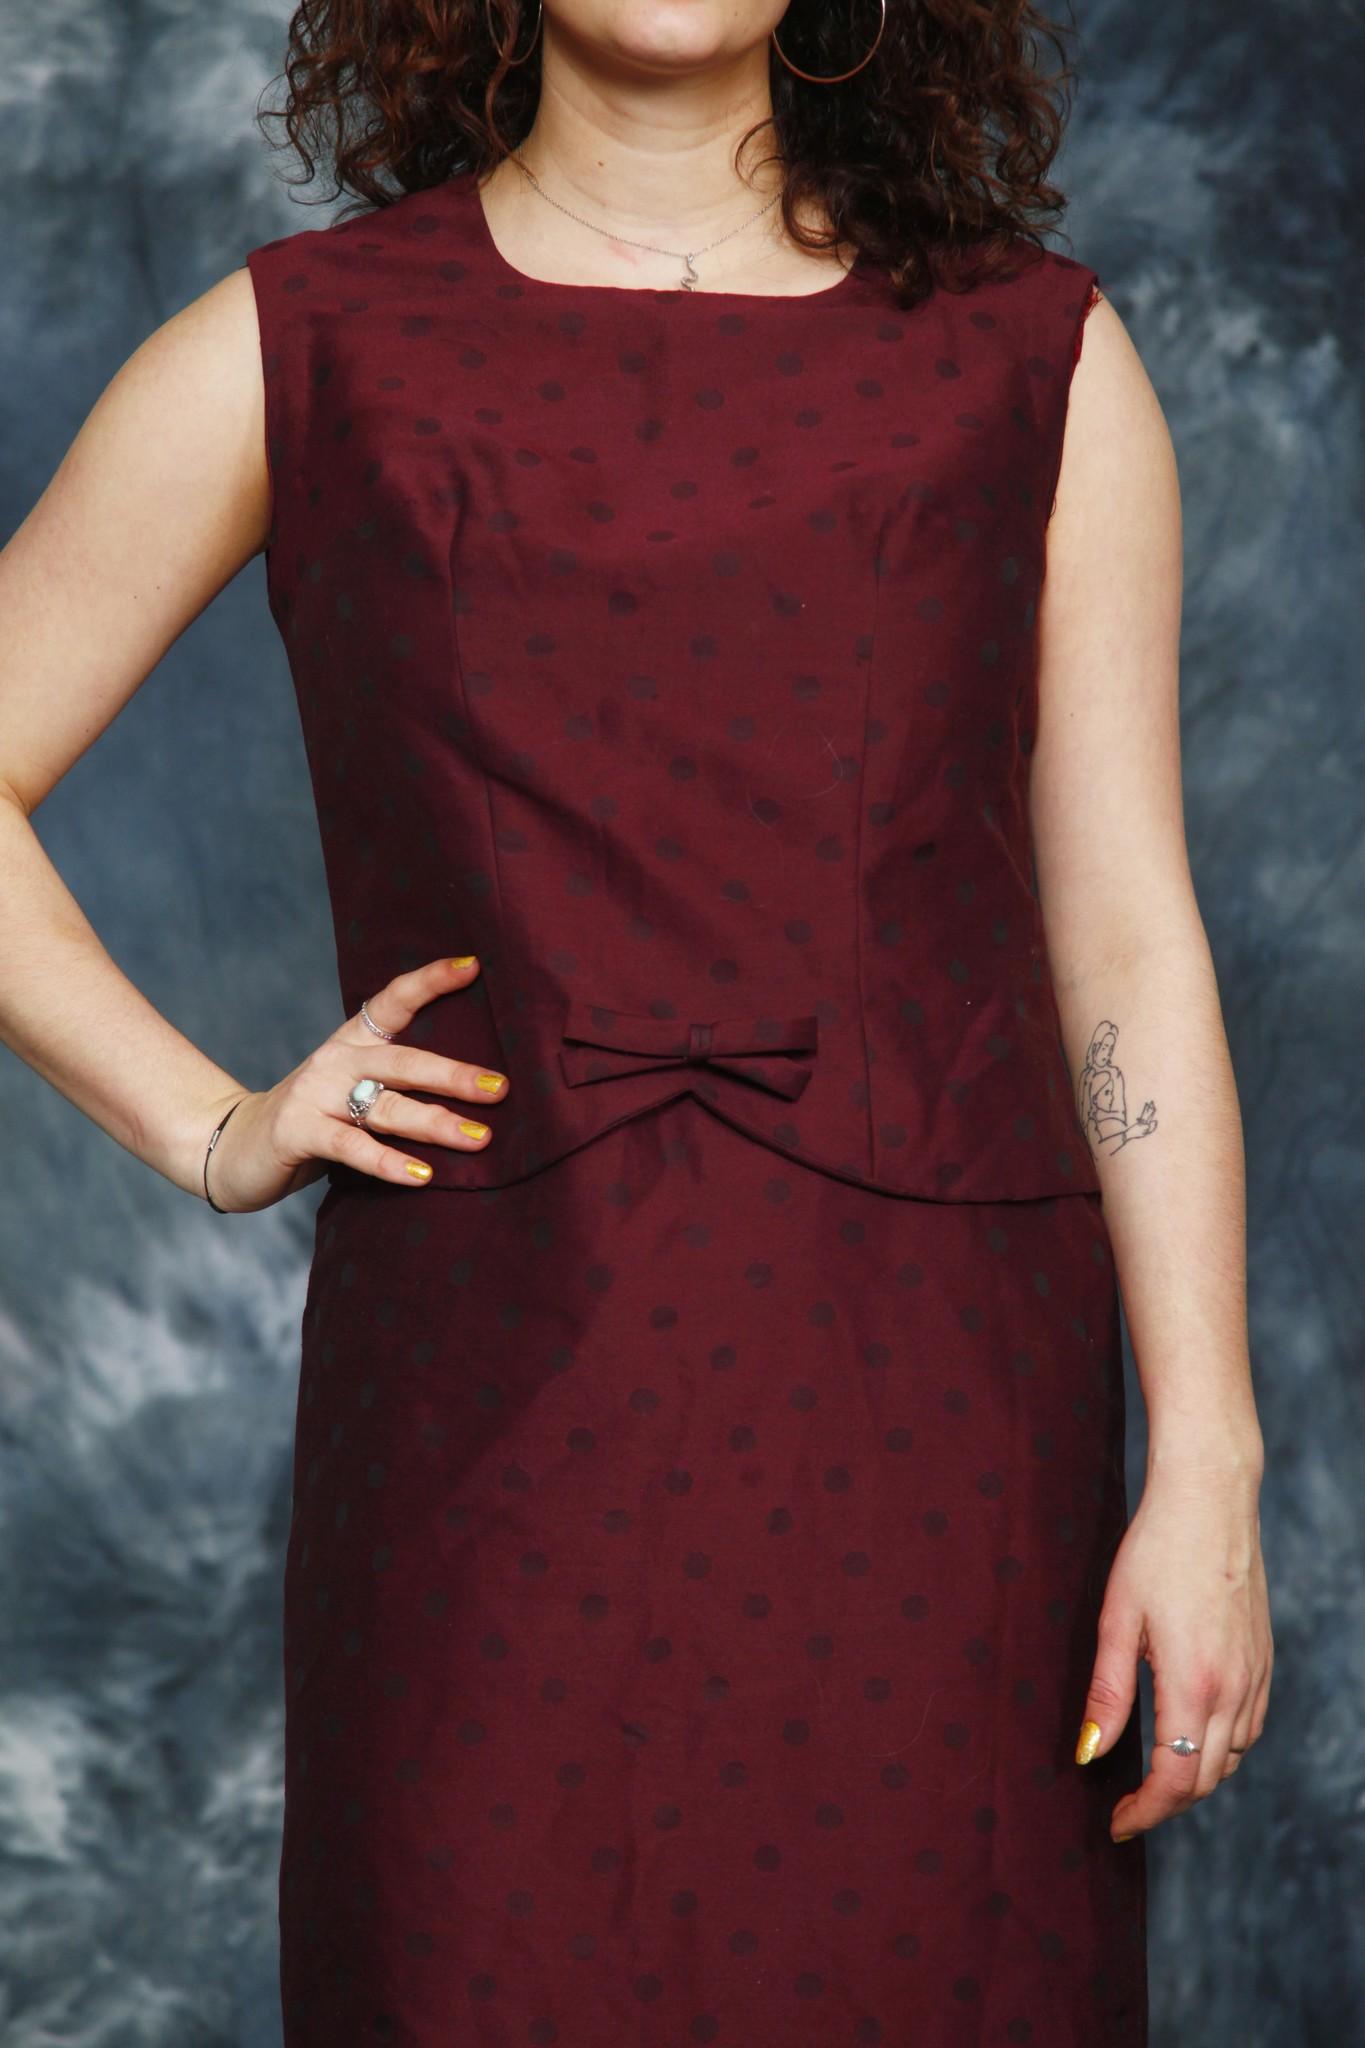 Red 60s dress